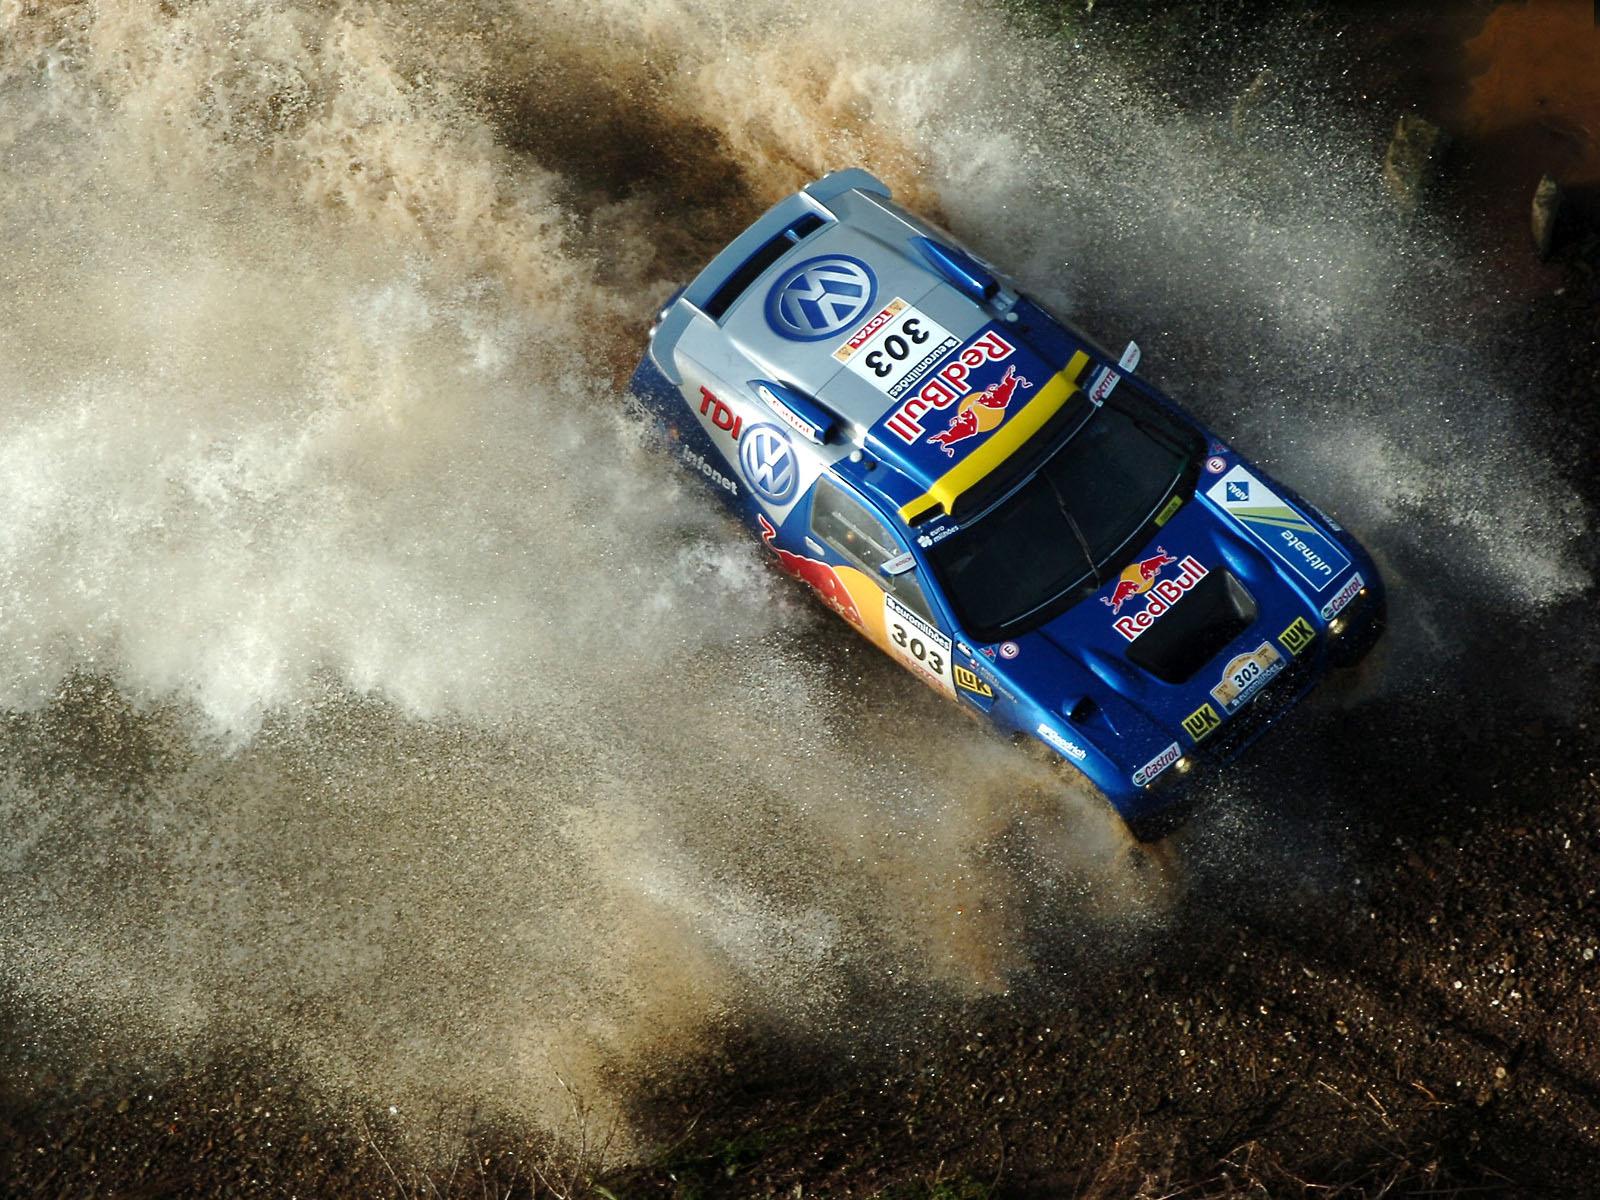 Дакар, Wolksvagen Dakar rally car, авто, обои для рабочего стола, вид сверху